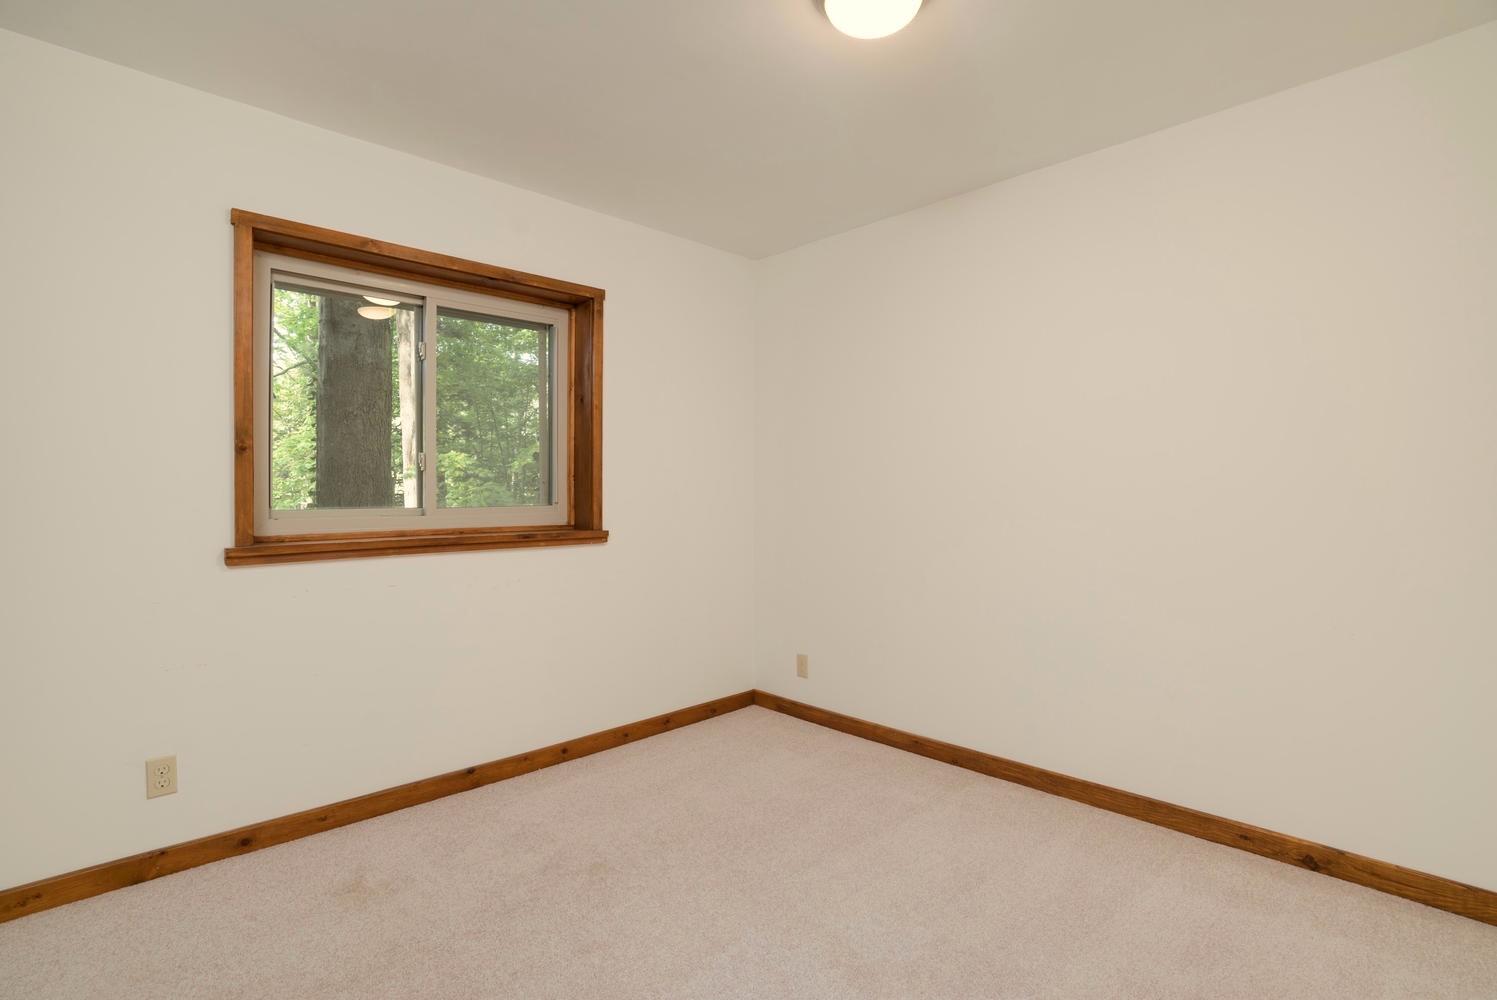 1000 Quaker Rd Orchard Park NY-large-020-10-Bedroom-1498x1000-72dpi